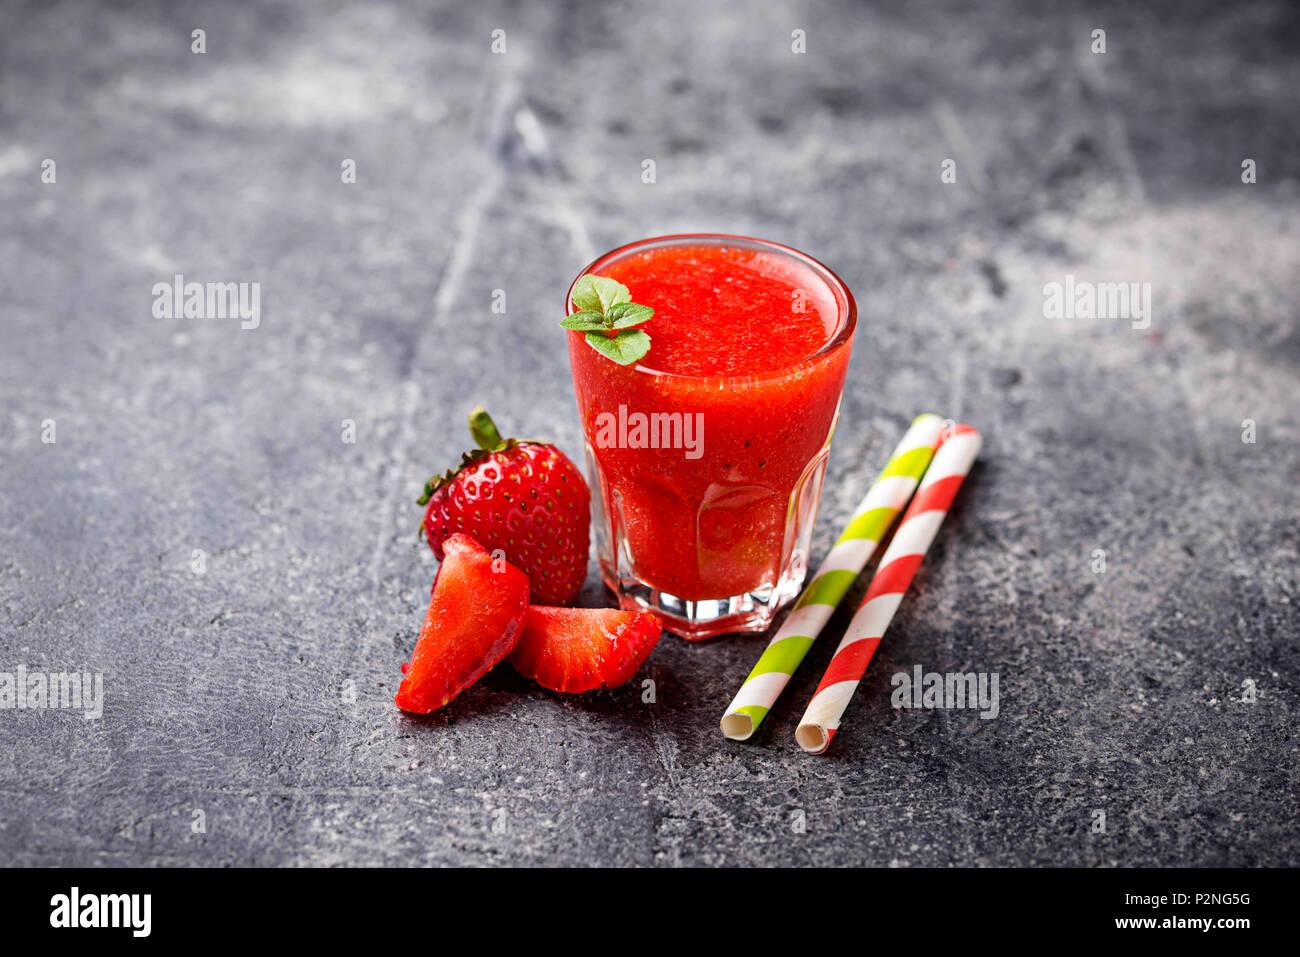 Dulce saludable cóctel batido de fresa Imagen De Stock